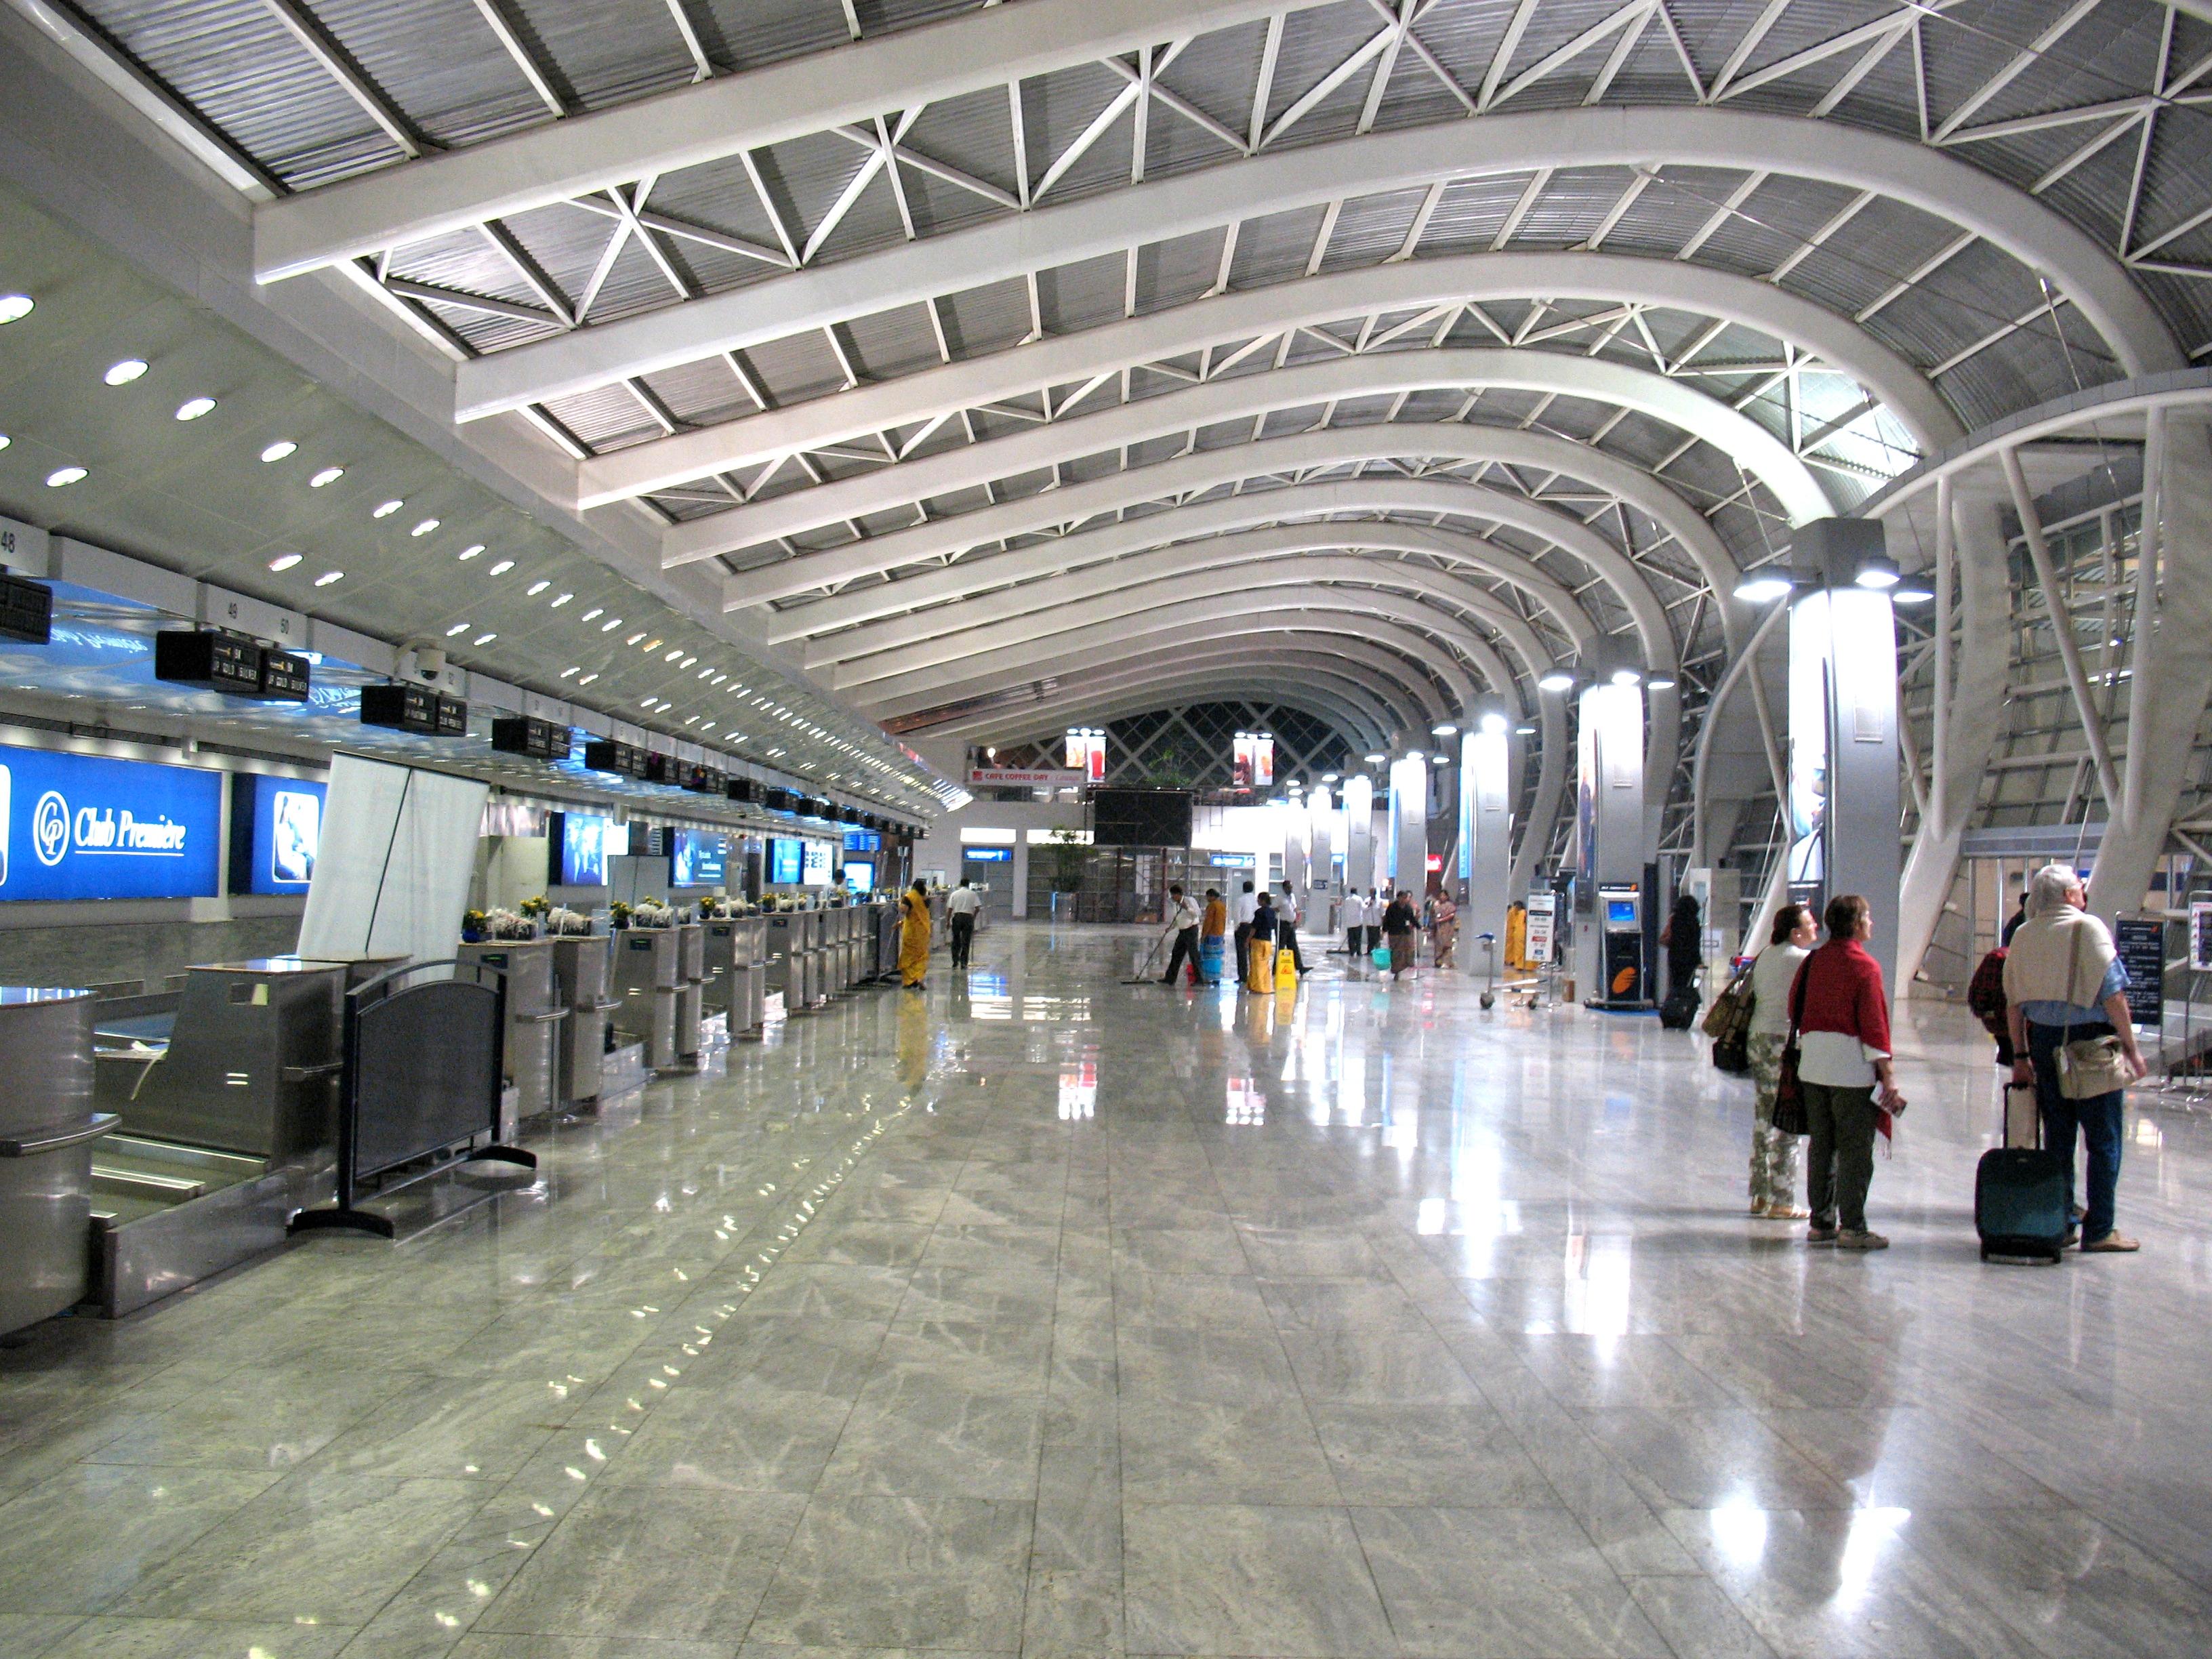 Chhatrapati Shivaji International Airport in Mumbai